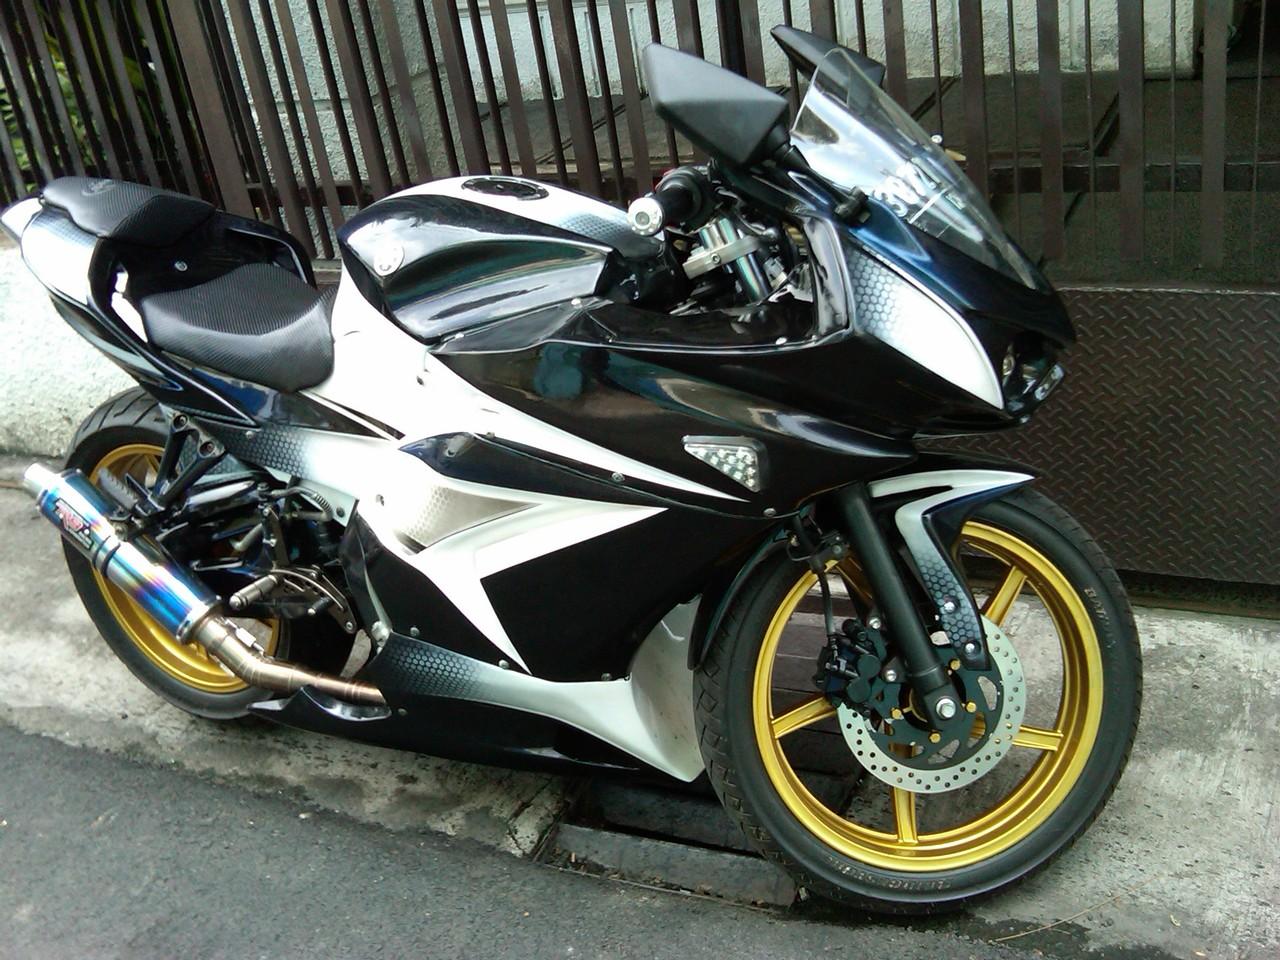 Modif Motor Yamaha Vixion New